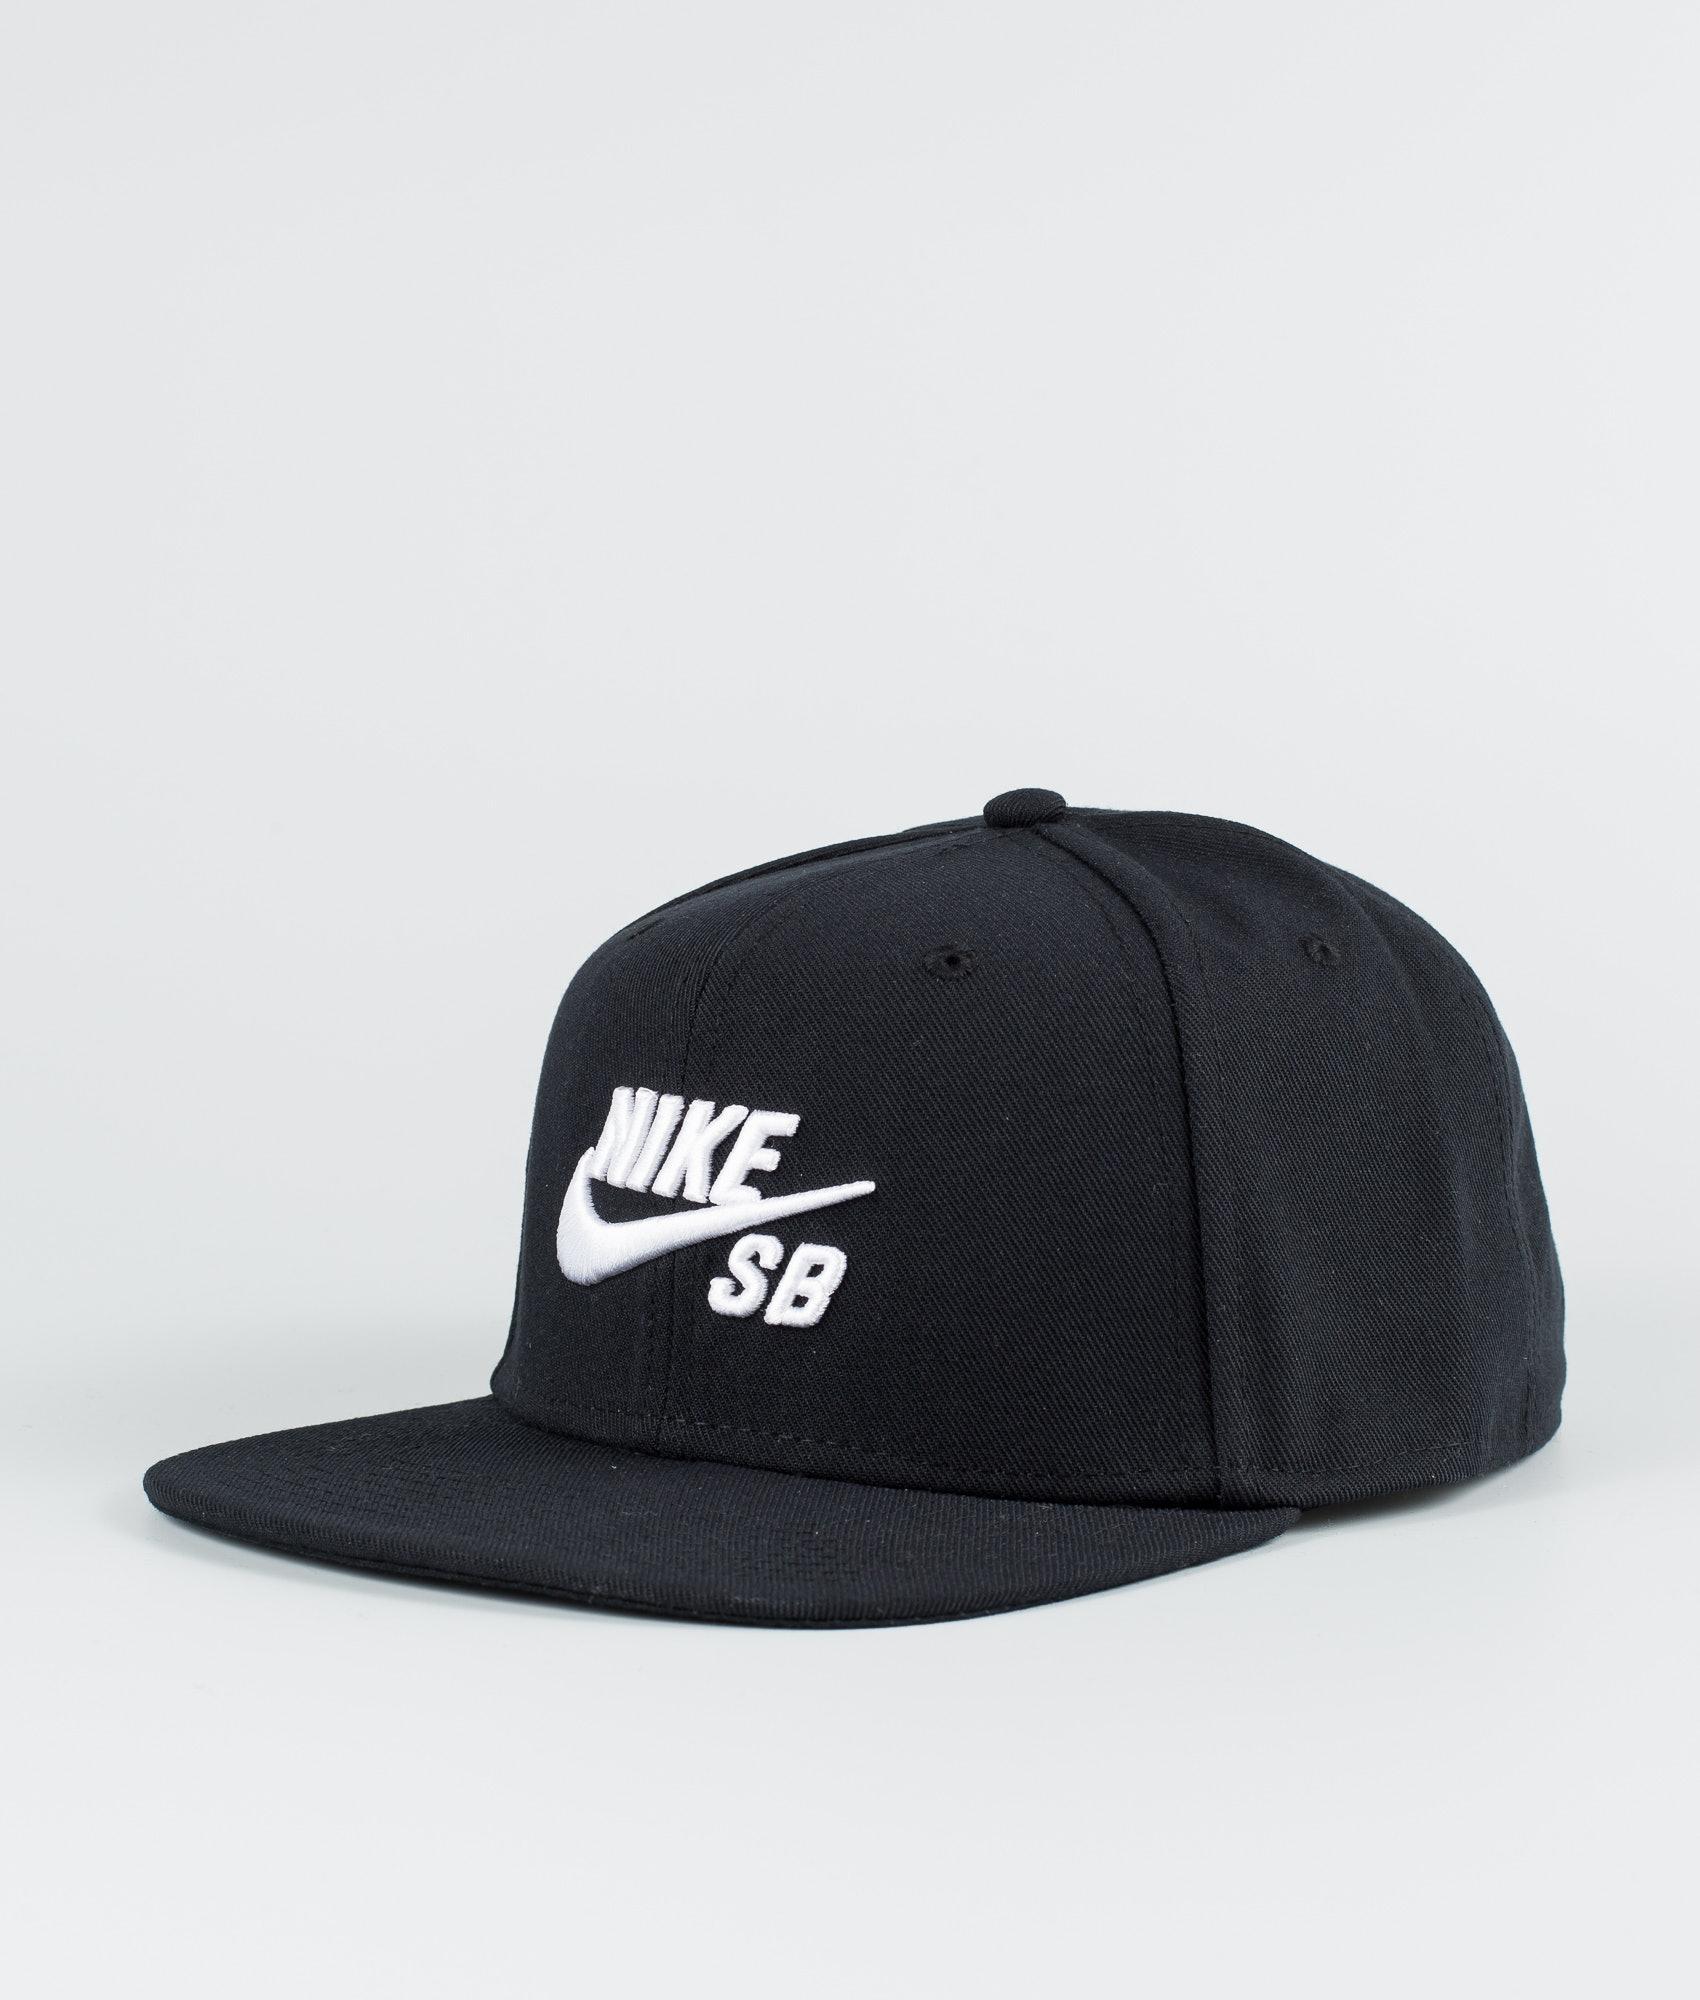 e71f4abe0c370 Nike